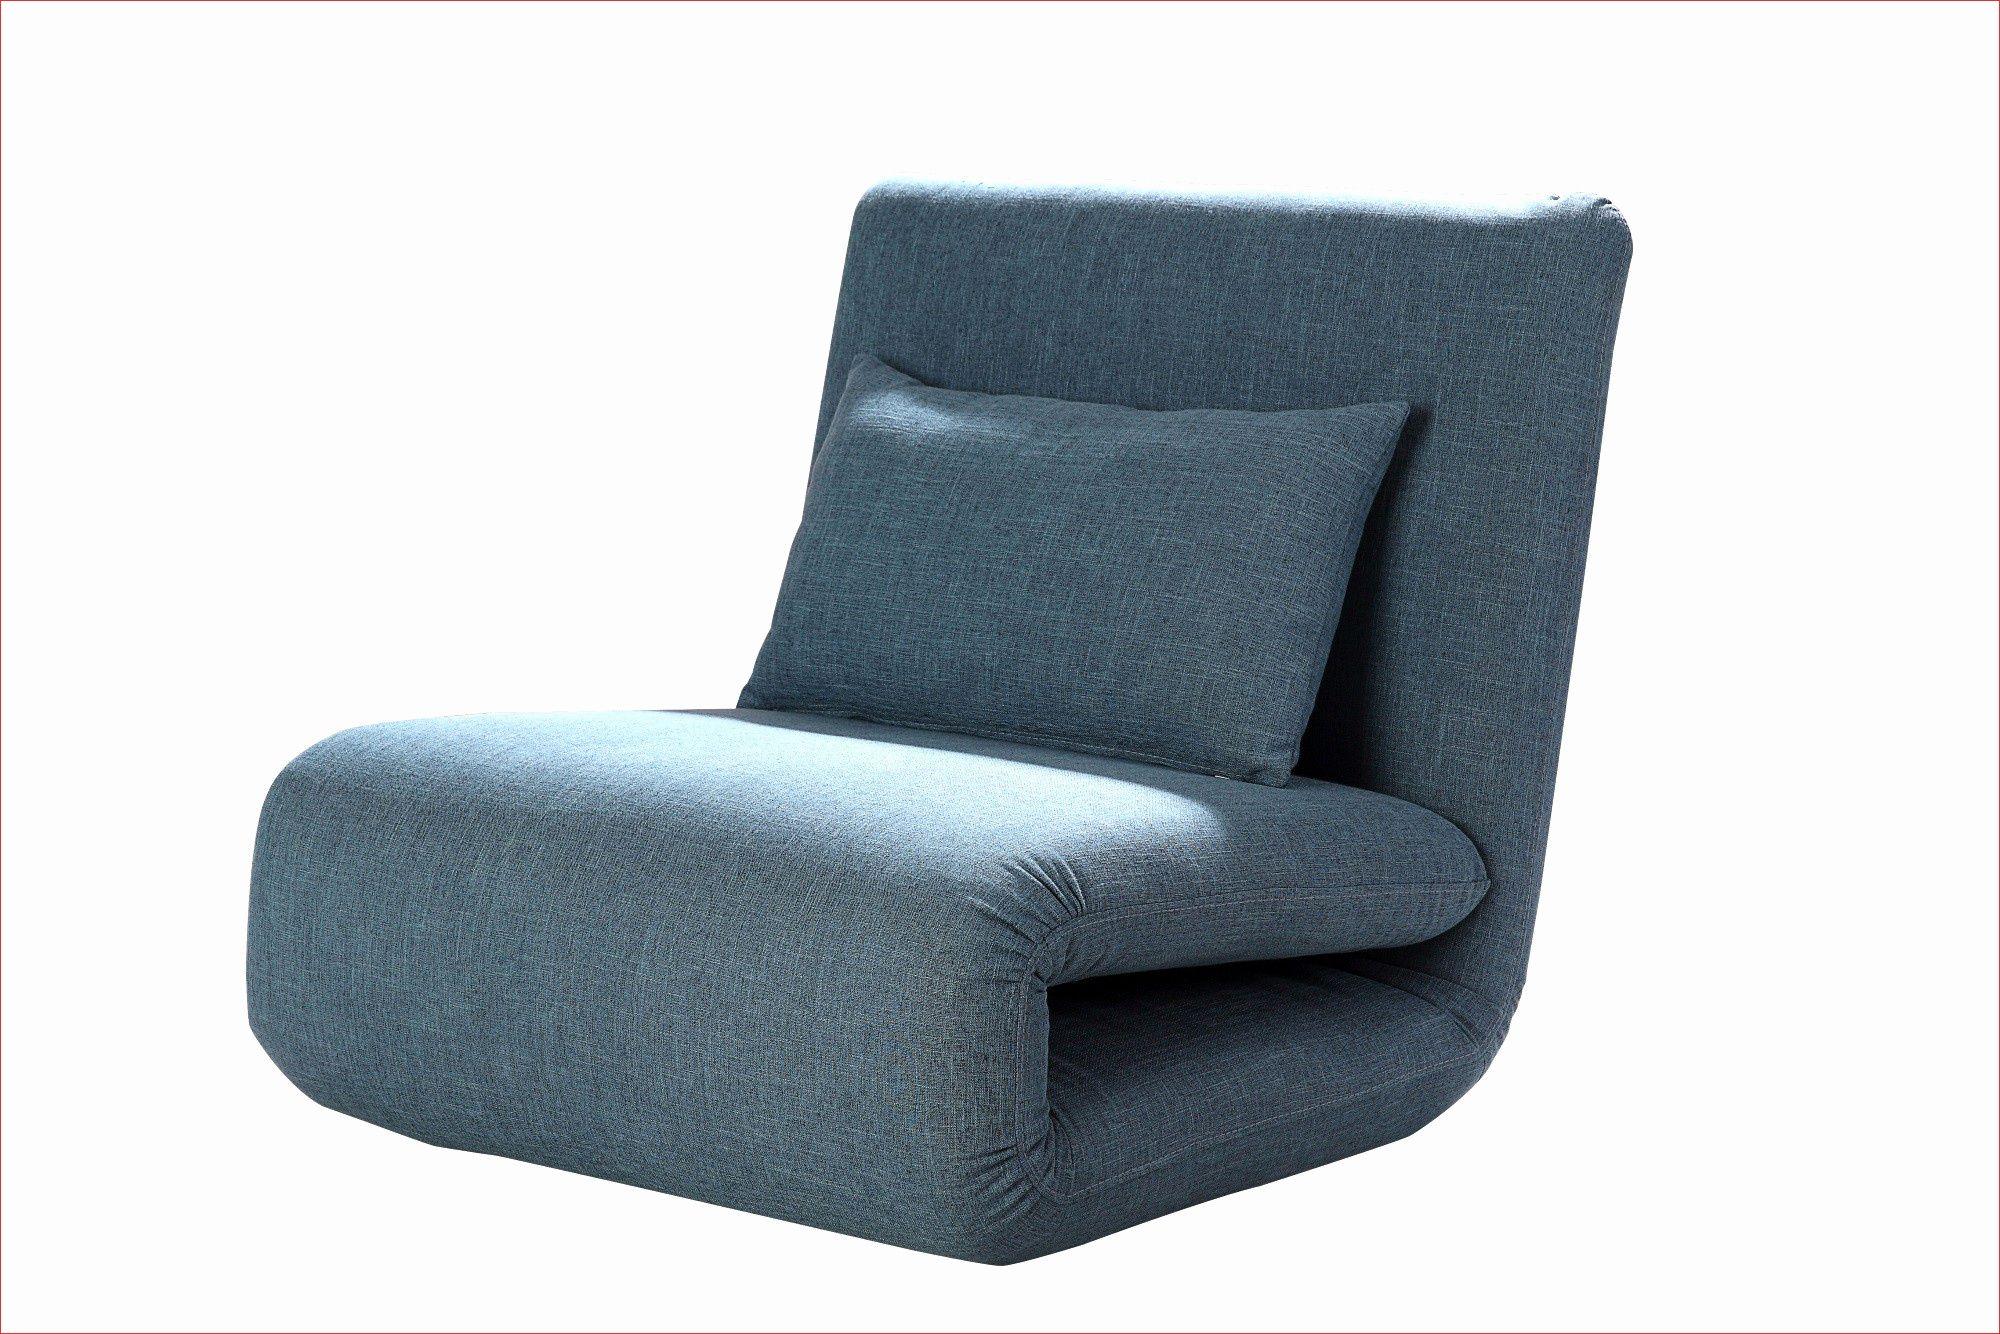 15 Incroyable Fauteuil Confortable Ikea Gallery   Fauteuil ... pour Fauteuil Convertible 1 Place Alinea